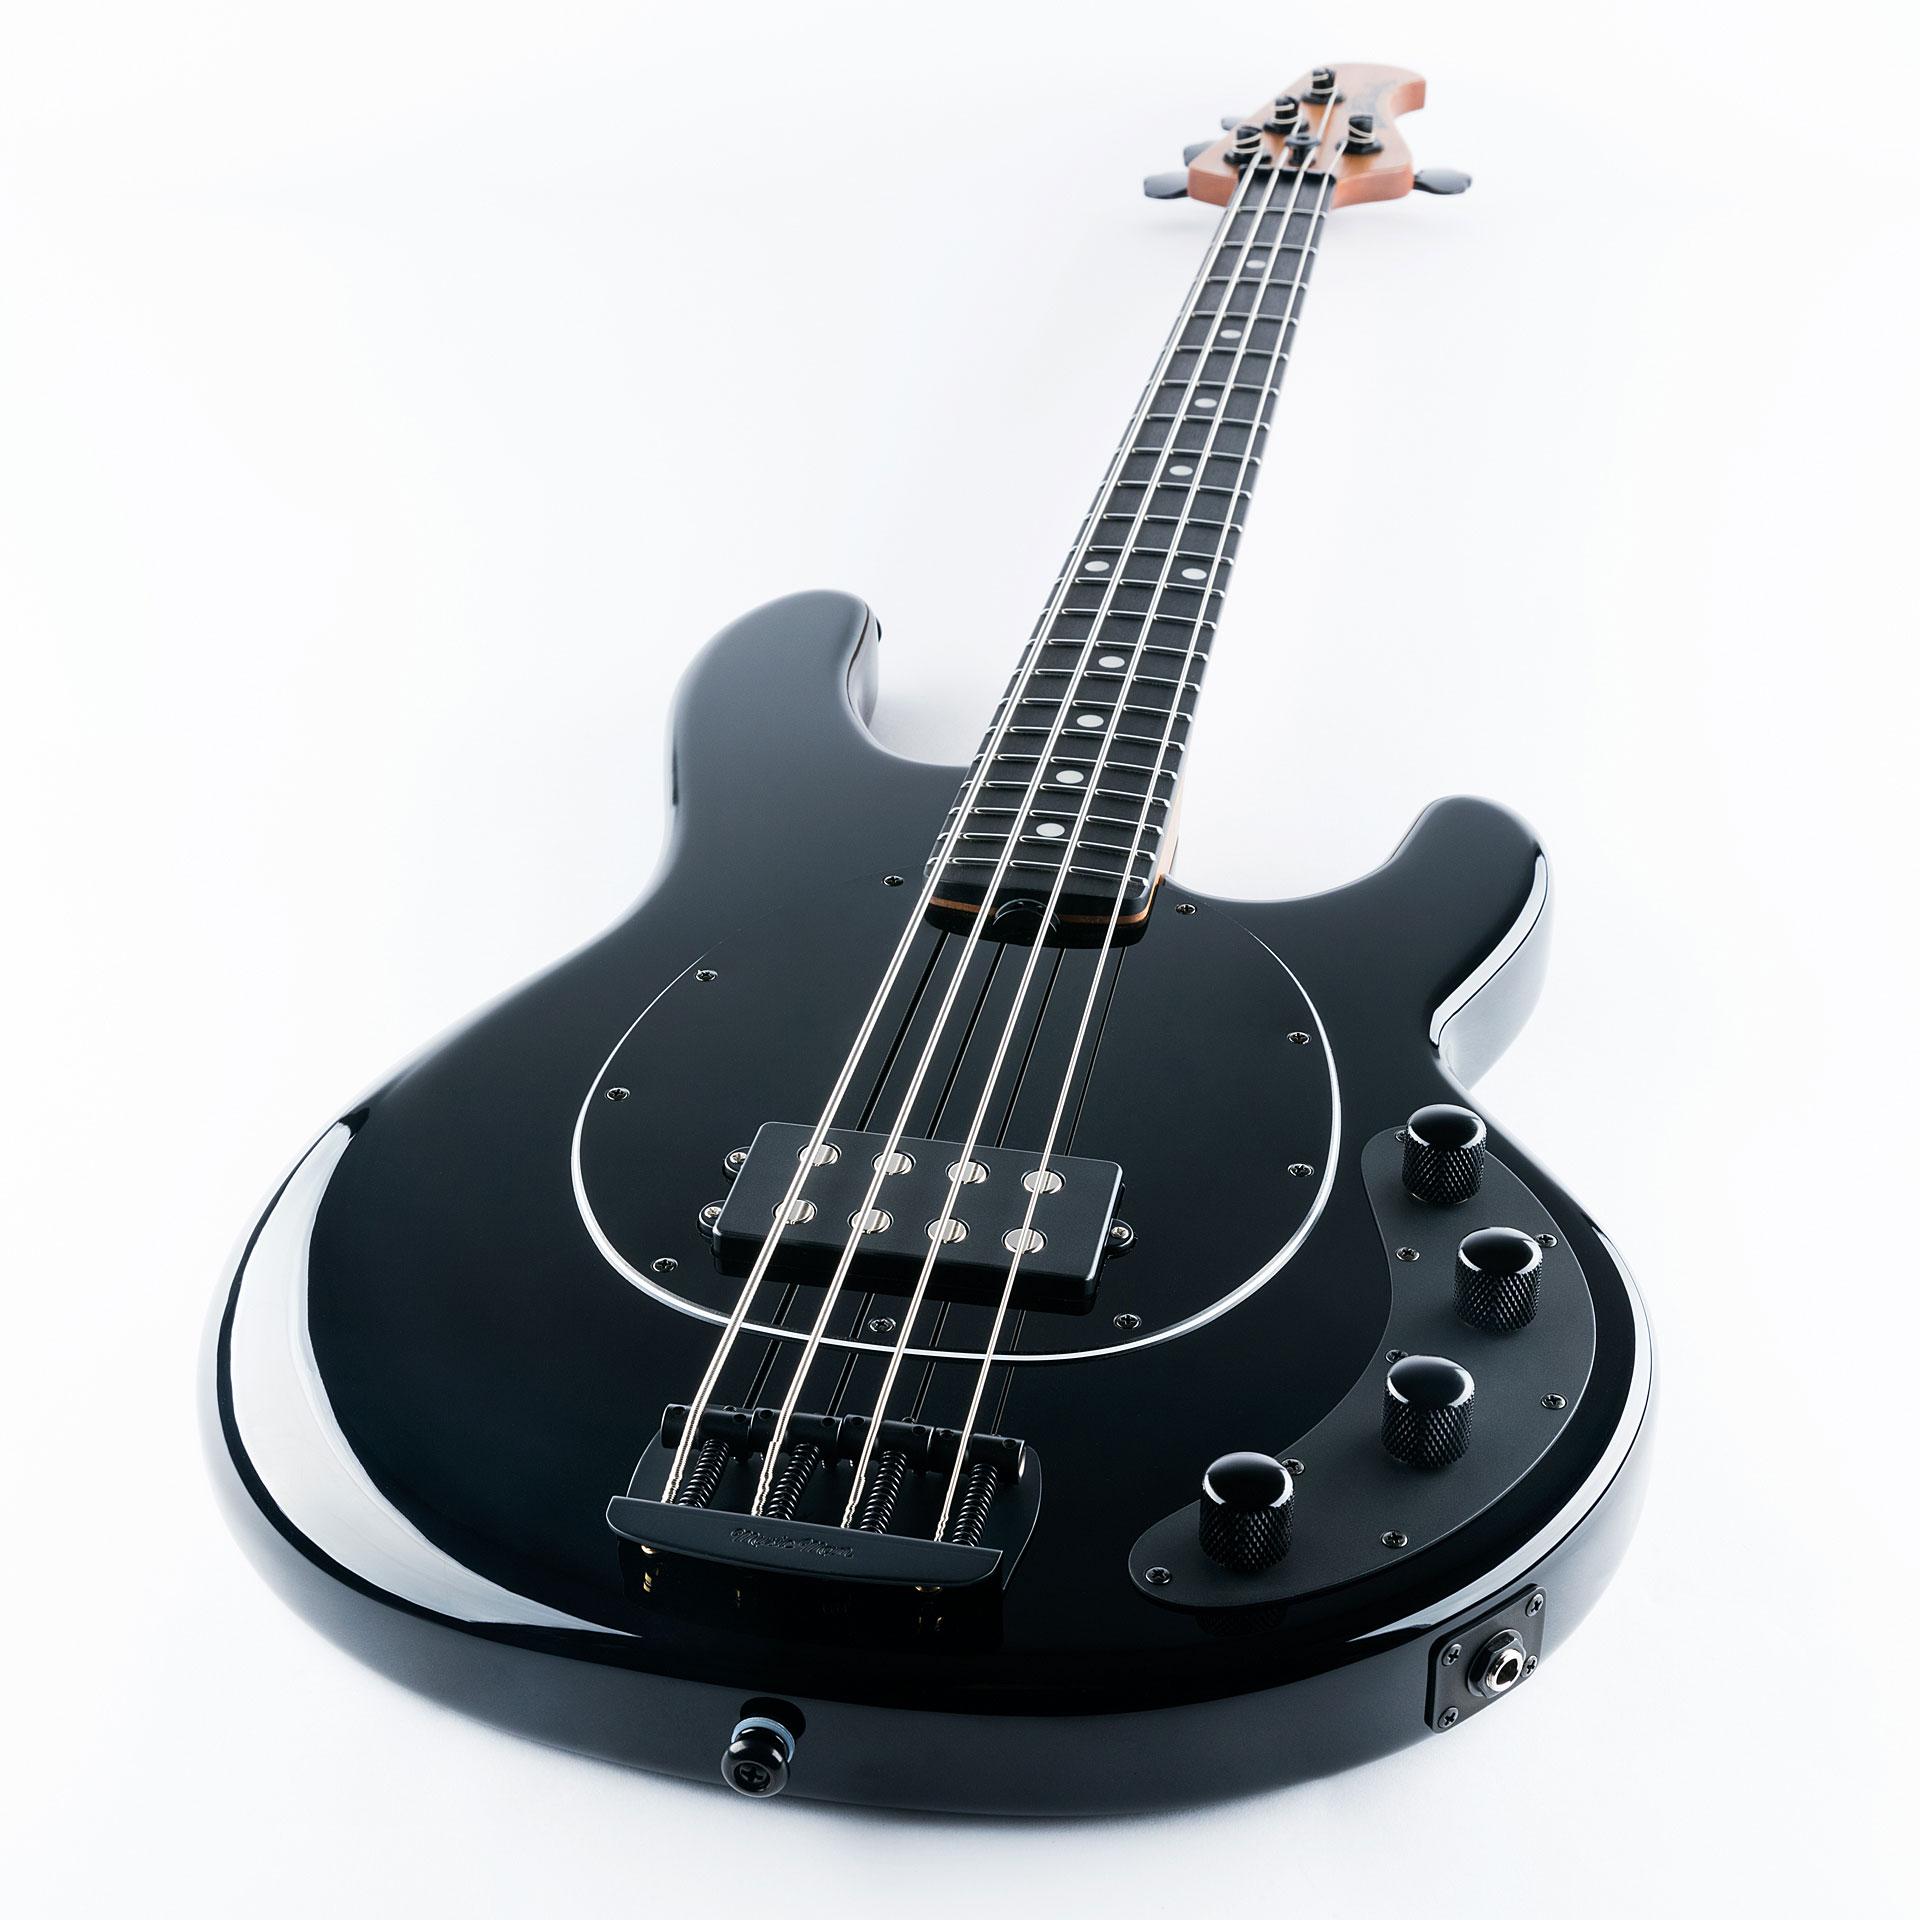 music man stingray special mm107 eb jbk electric bass guitar. Black Bedroom Furniture Sets. Home Design Ideas